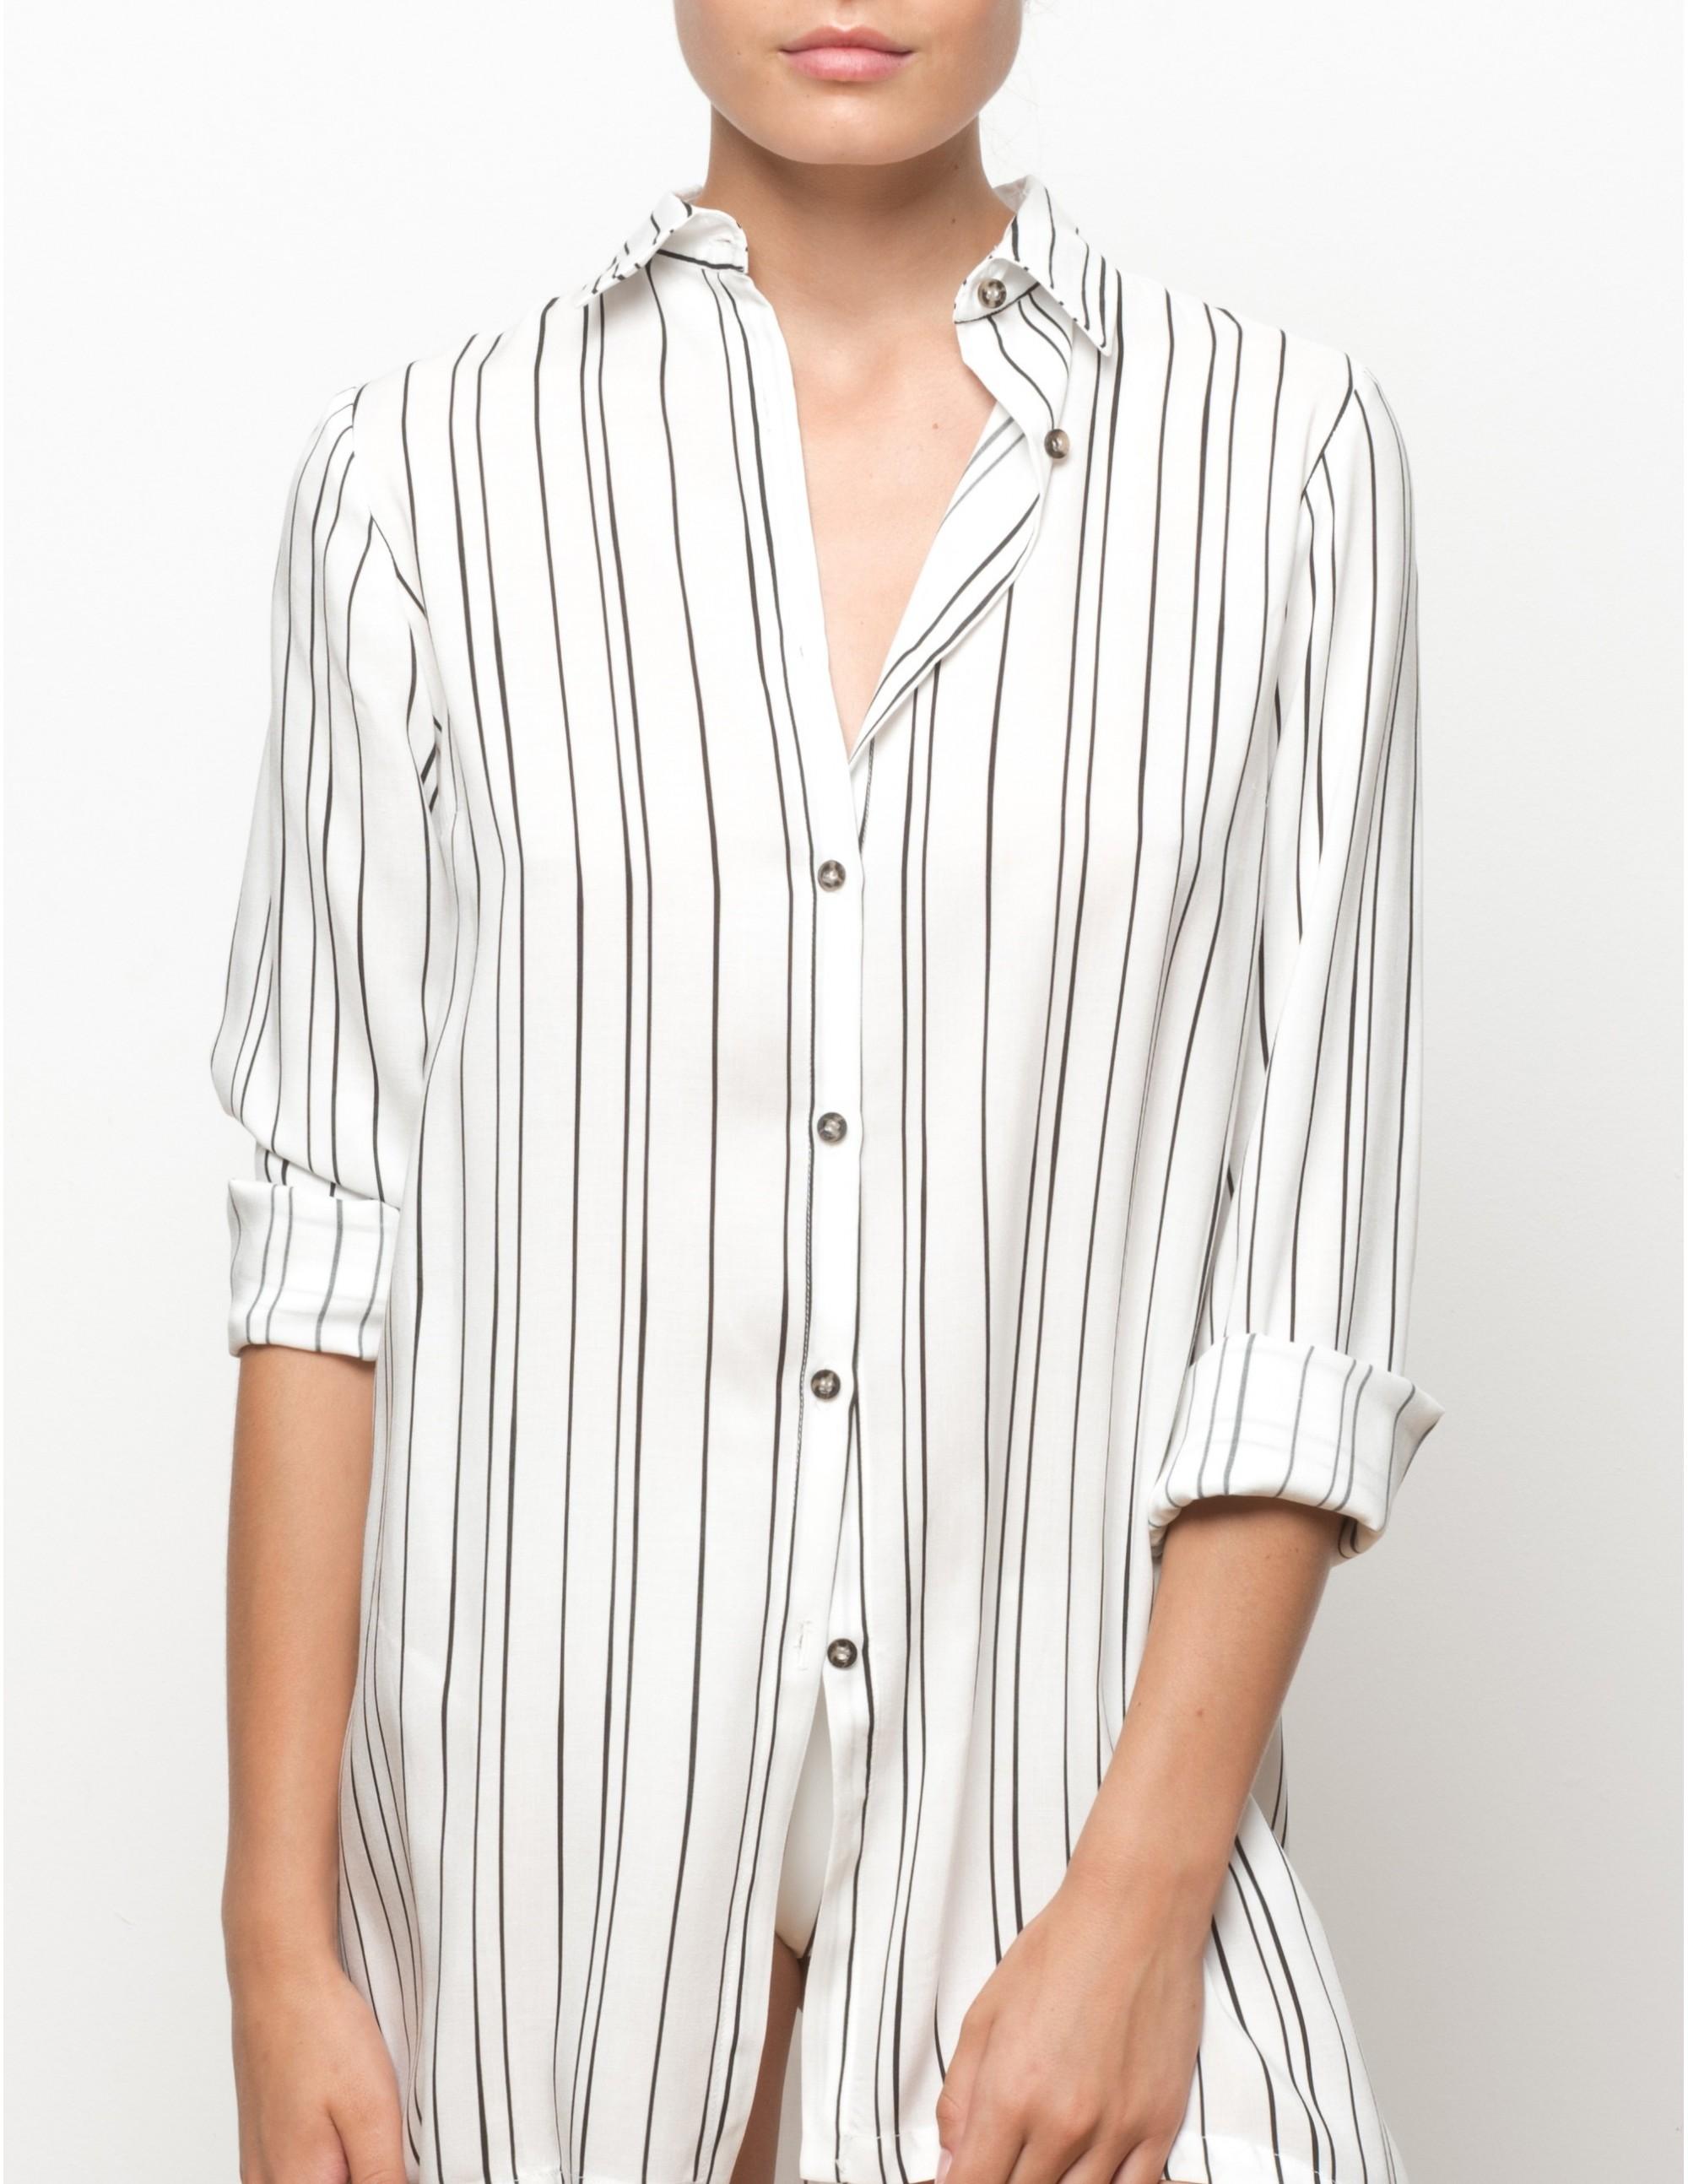 KIGO camisa - LIMITLESS